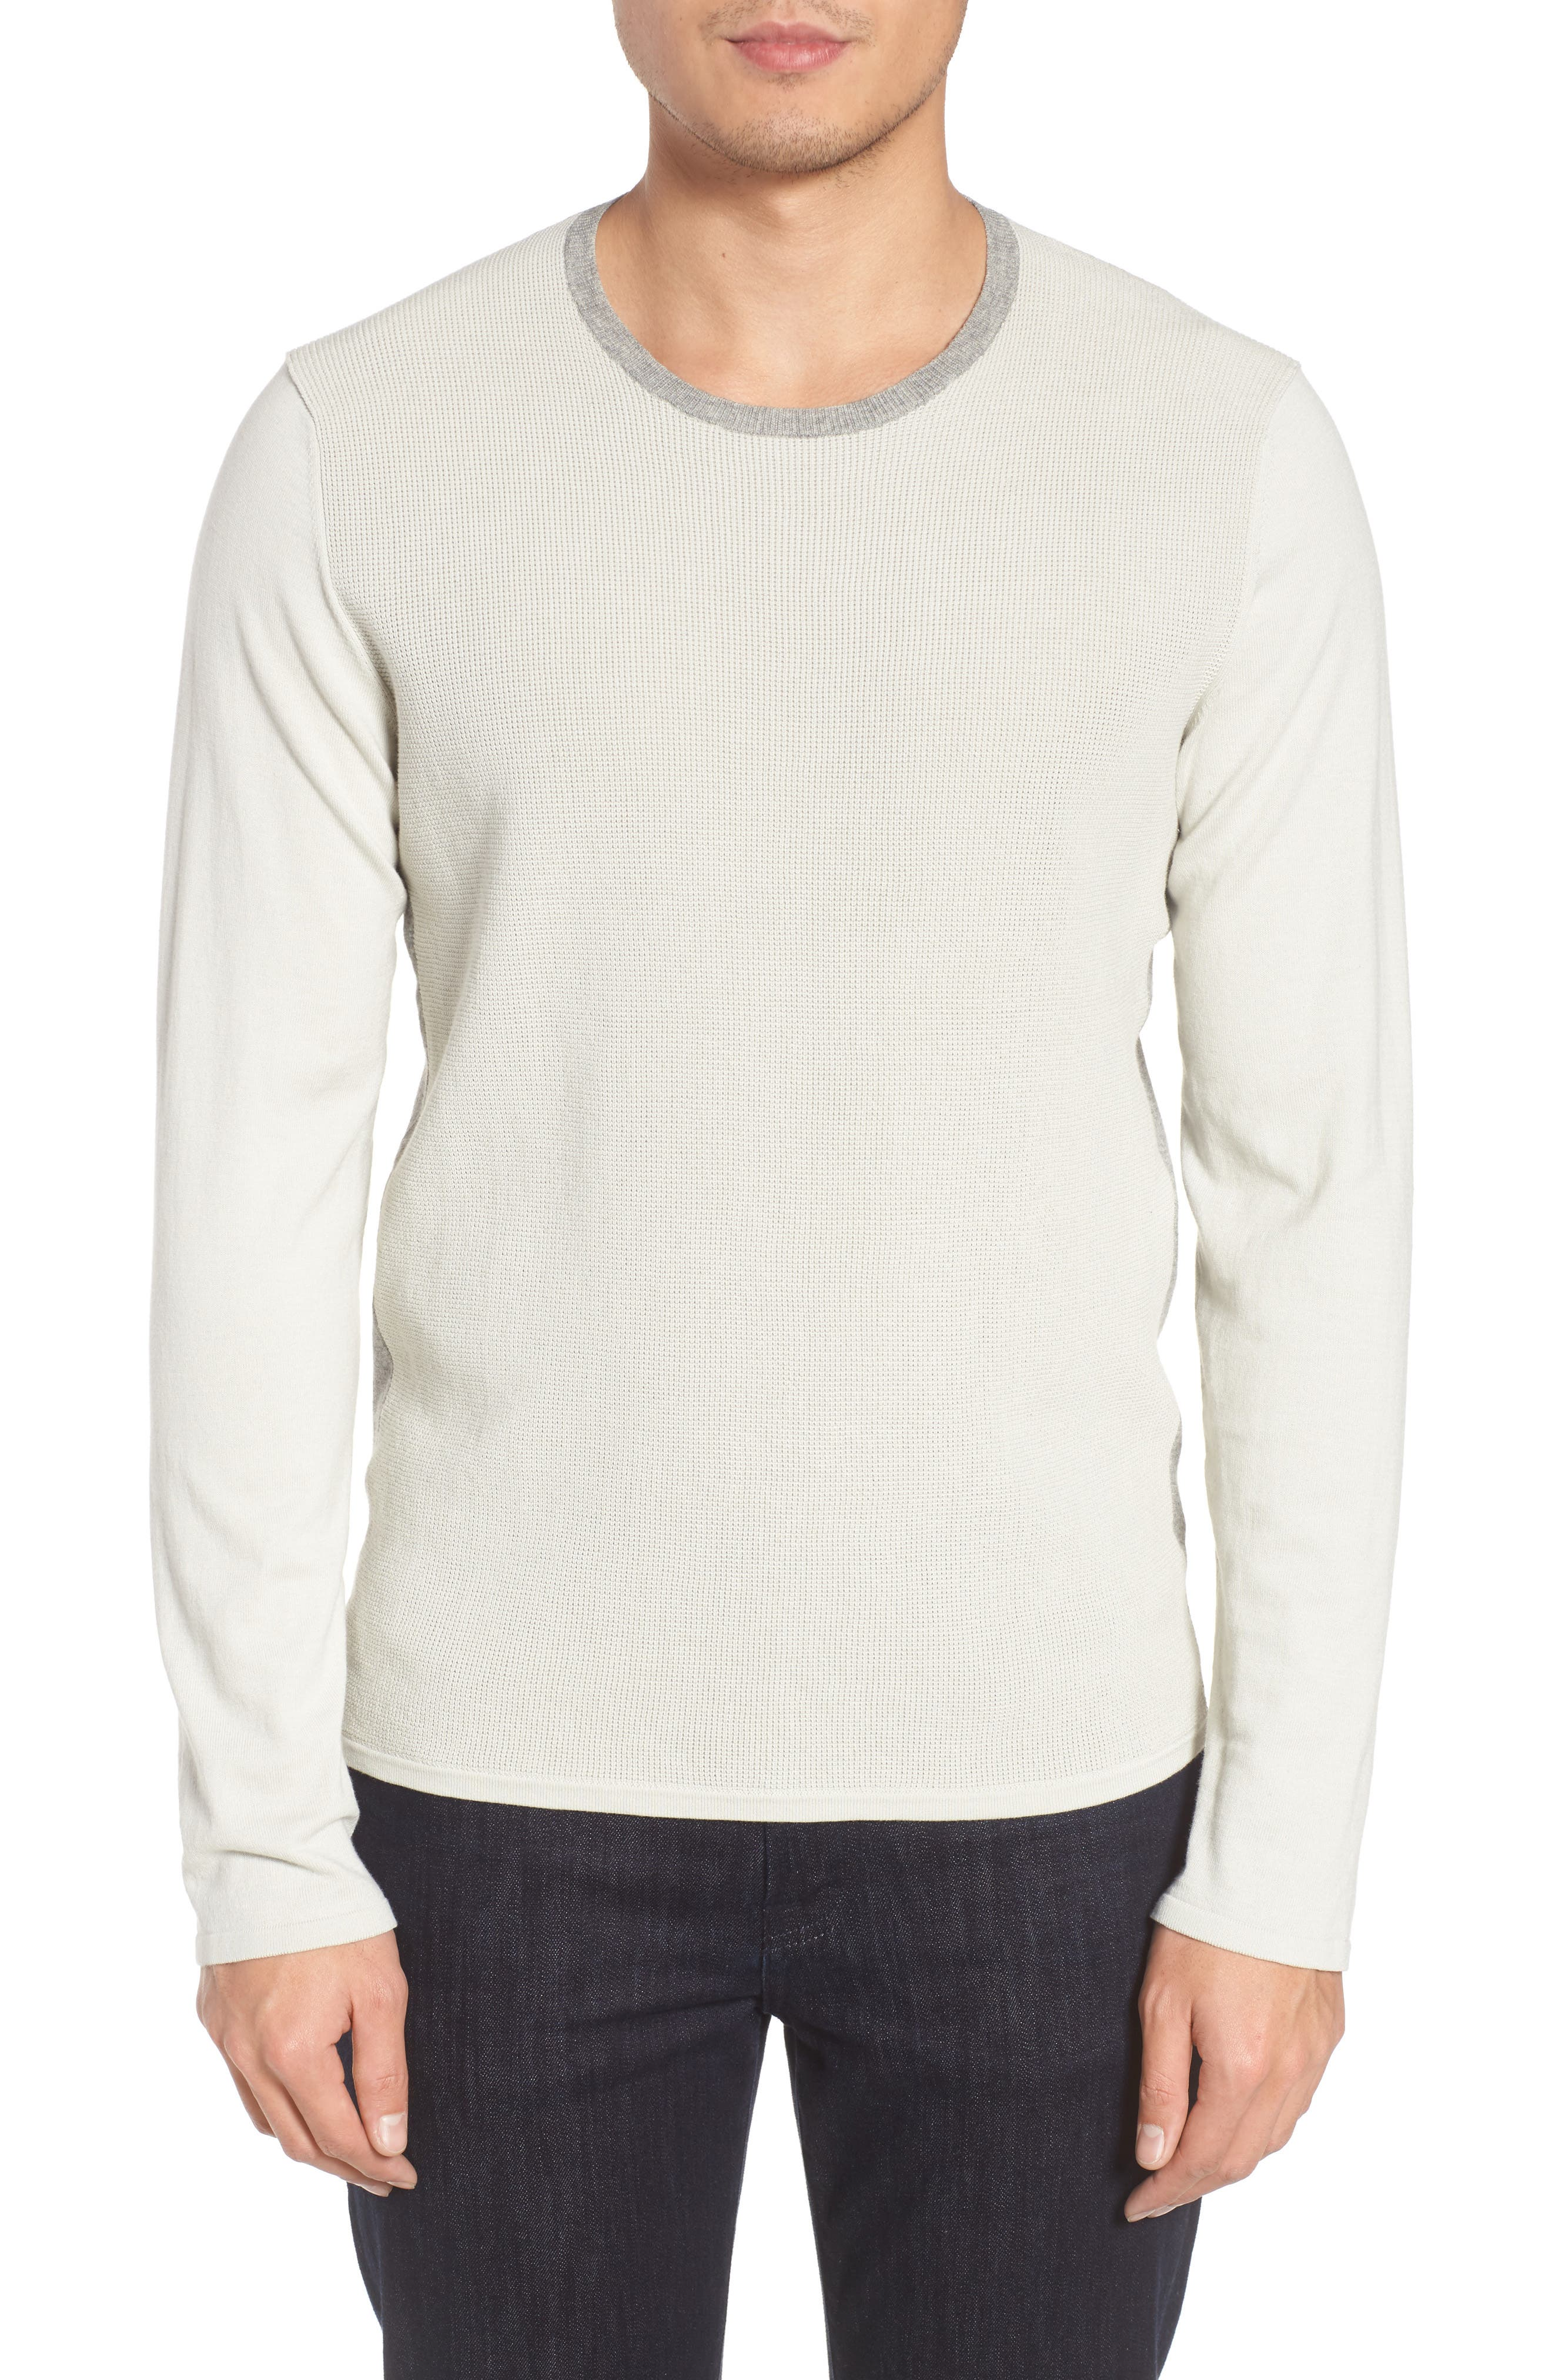 ZACHARY PRELL Lakeside Sweater, Main, color, LIGHT GREY